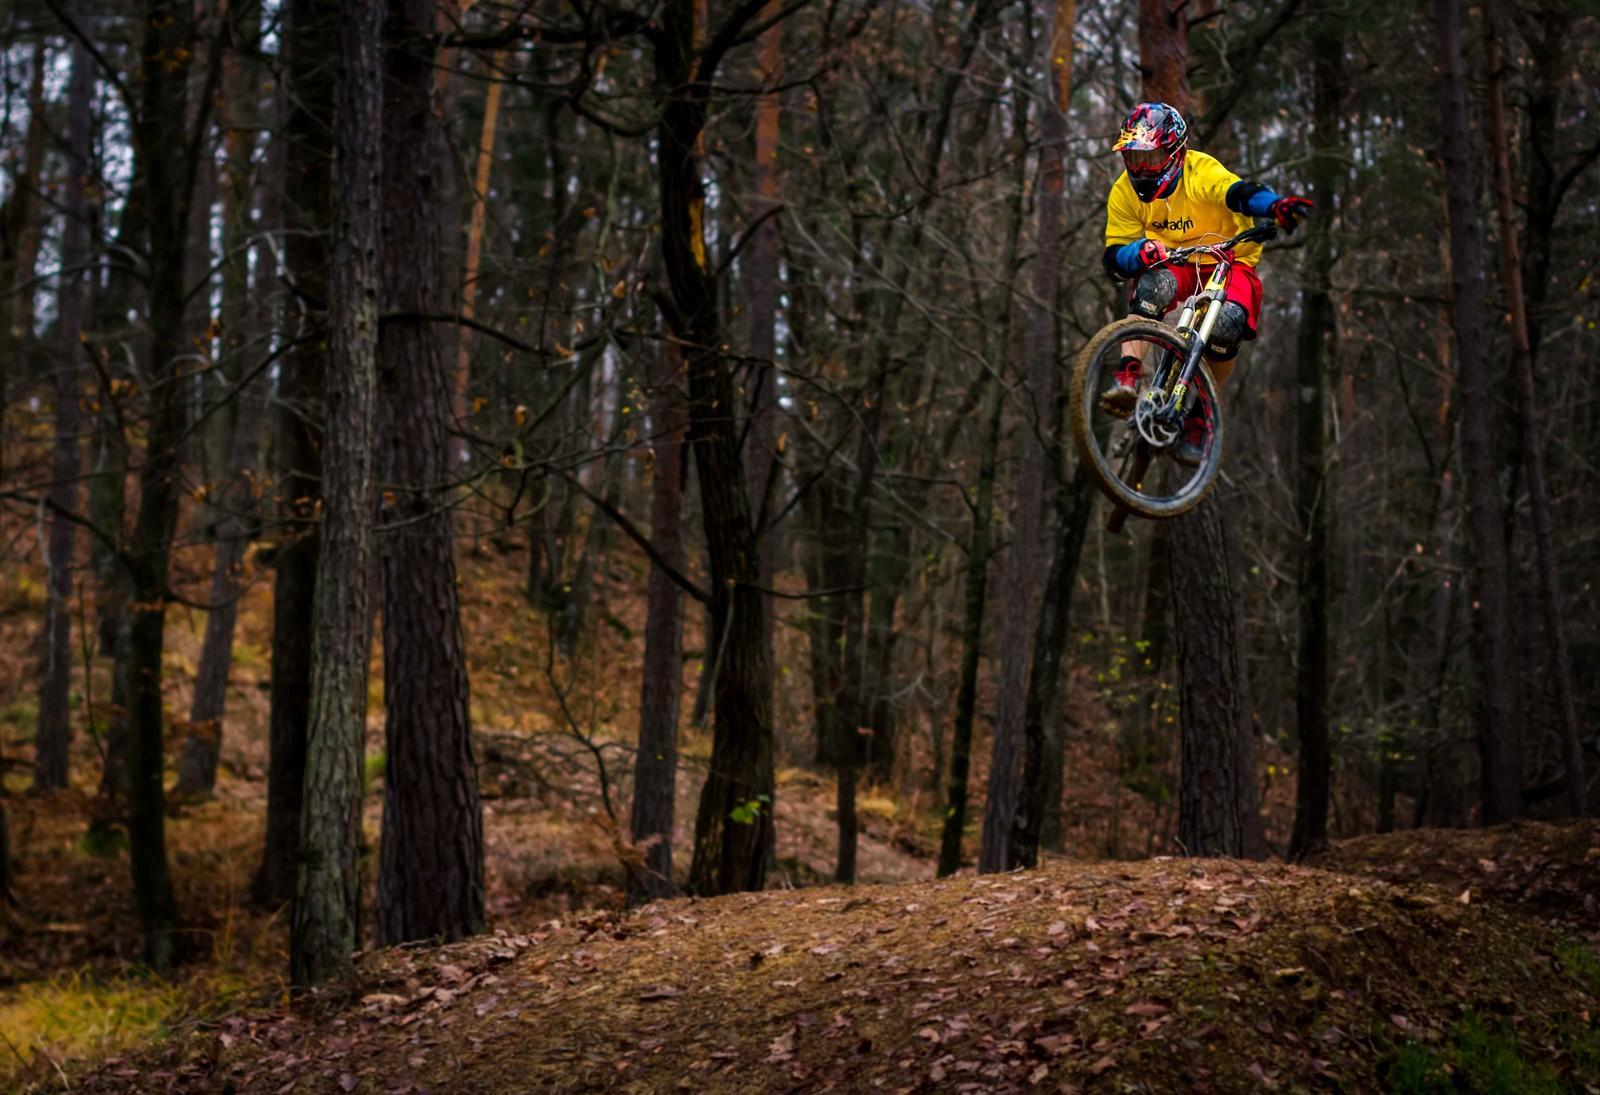 IMG 5673 - berto - Mountain Biking Pictures - Vital MTB